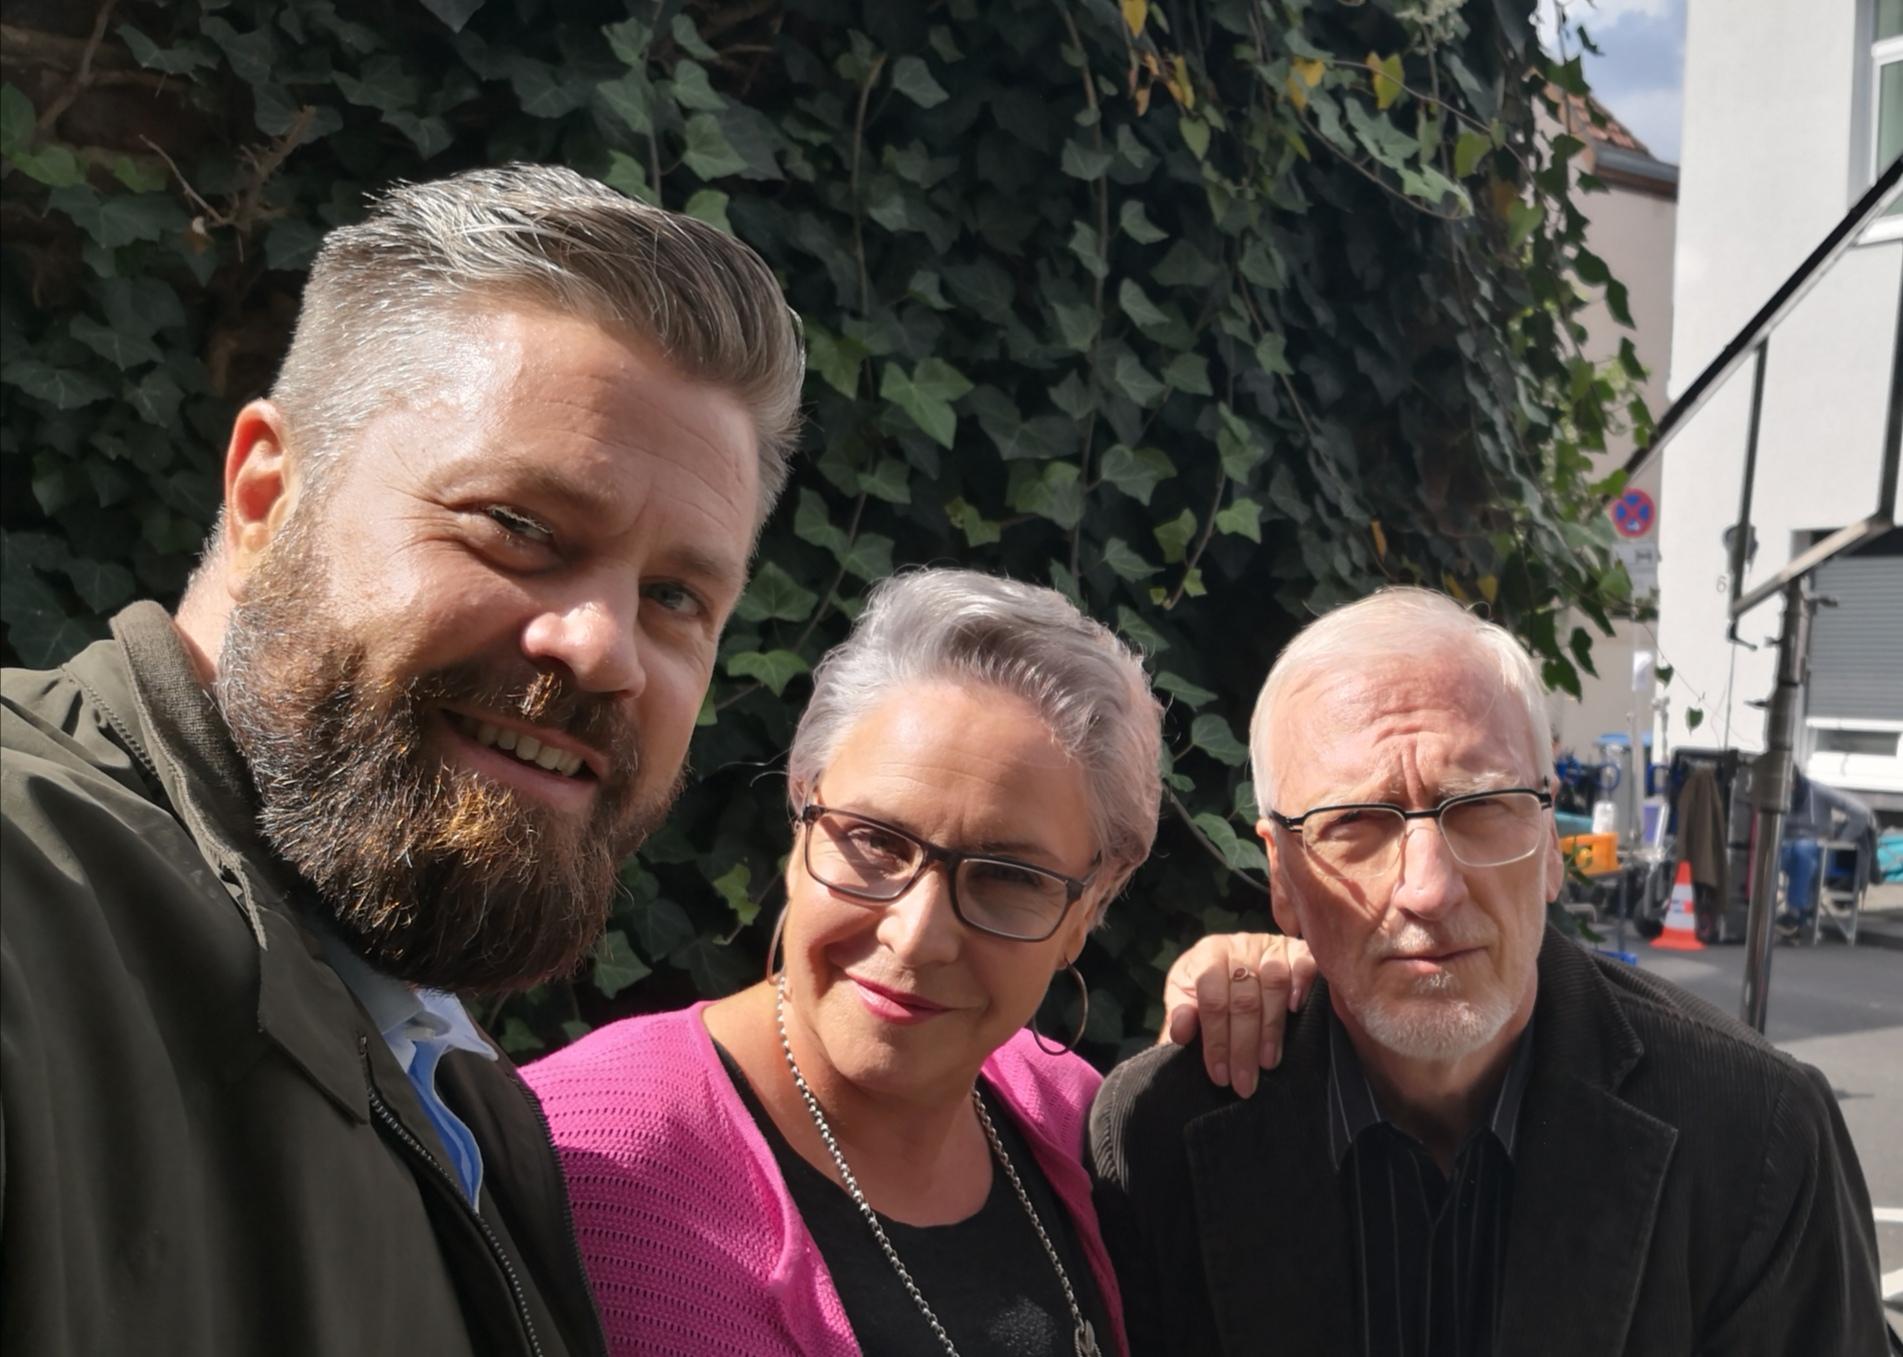 Andreas Birkner dreht ARD-Degeto-Komödie